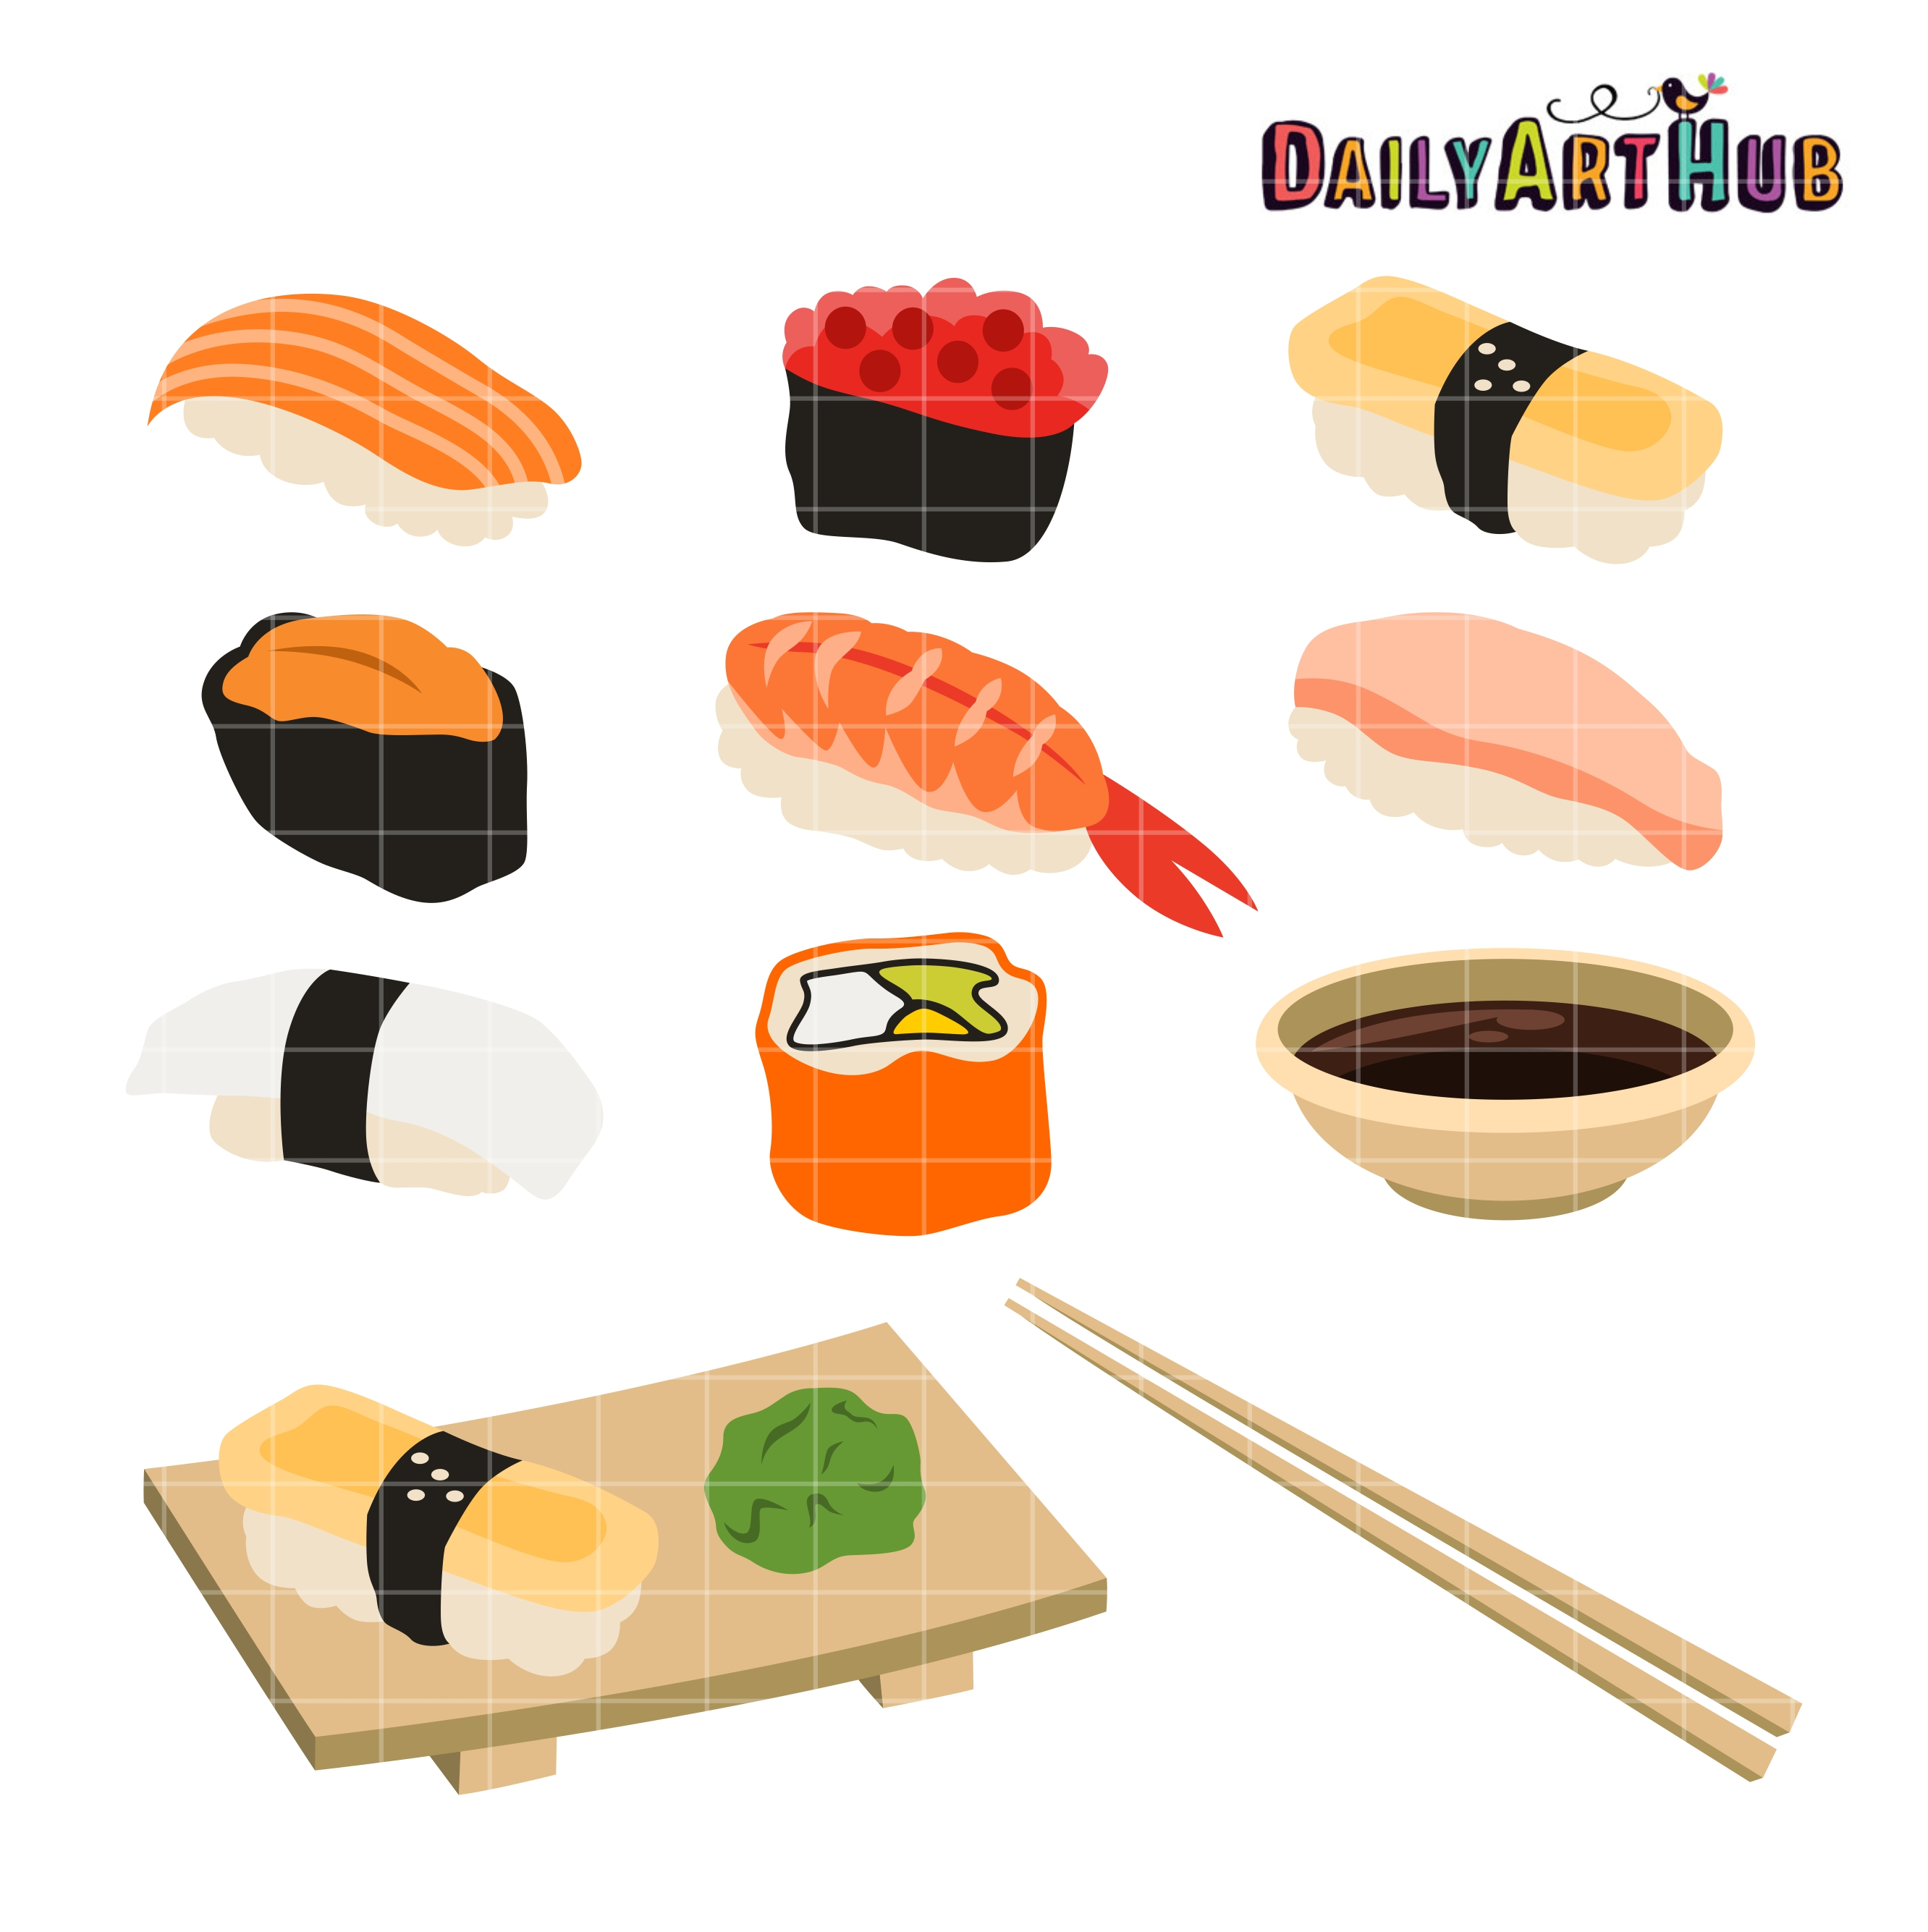 Sushi Clip Art Set Daily Art Hub Free Clip Art Everyday